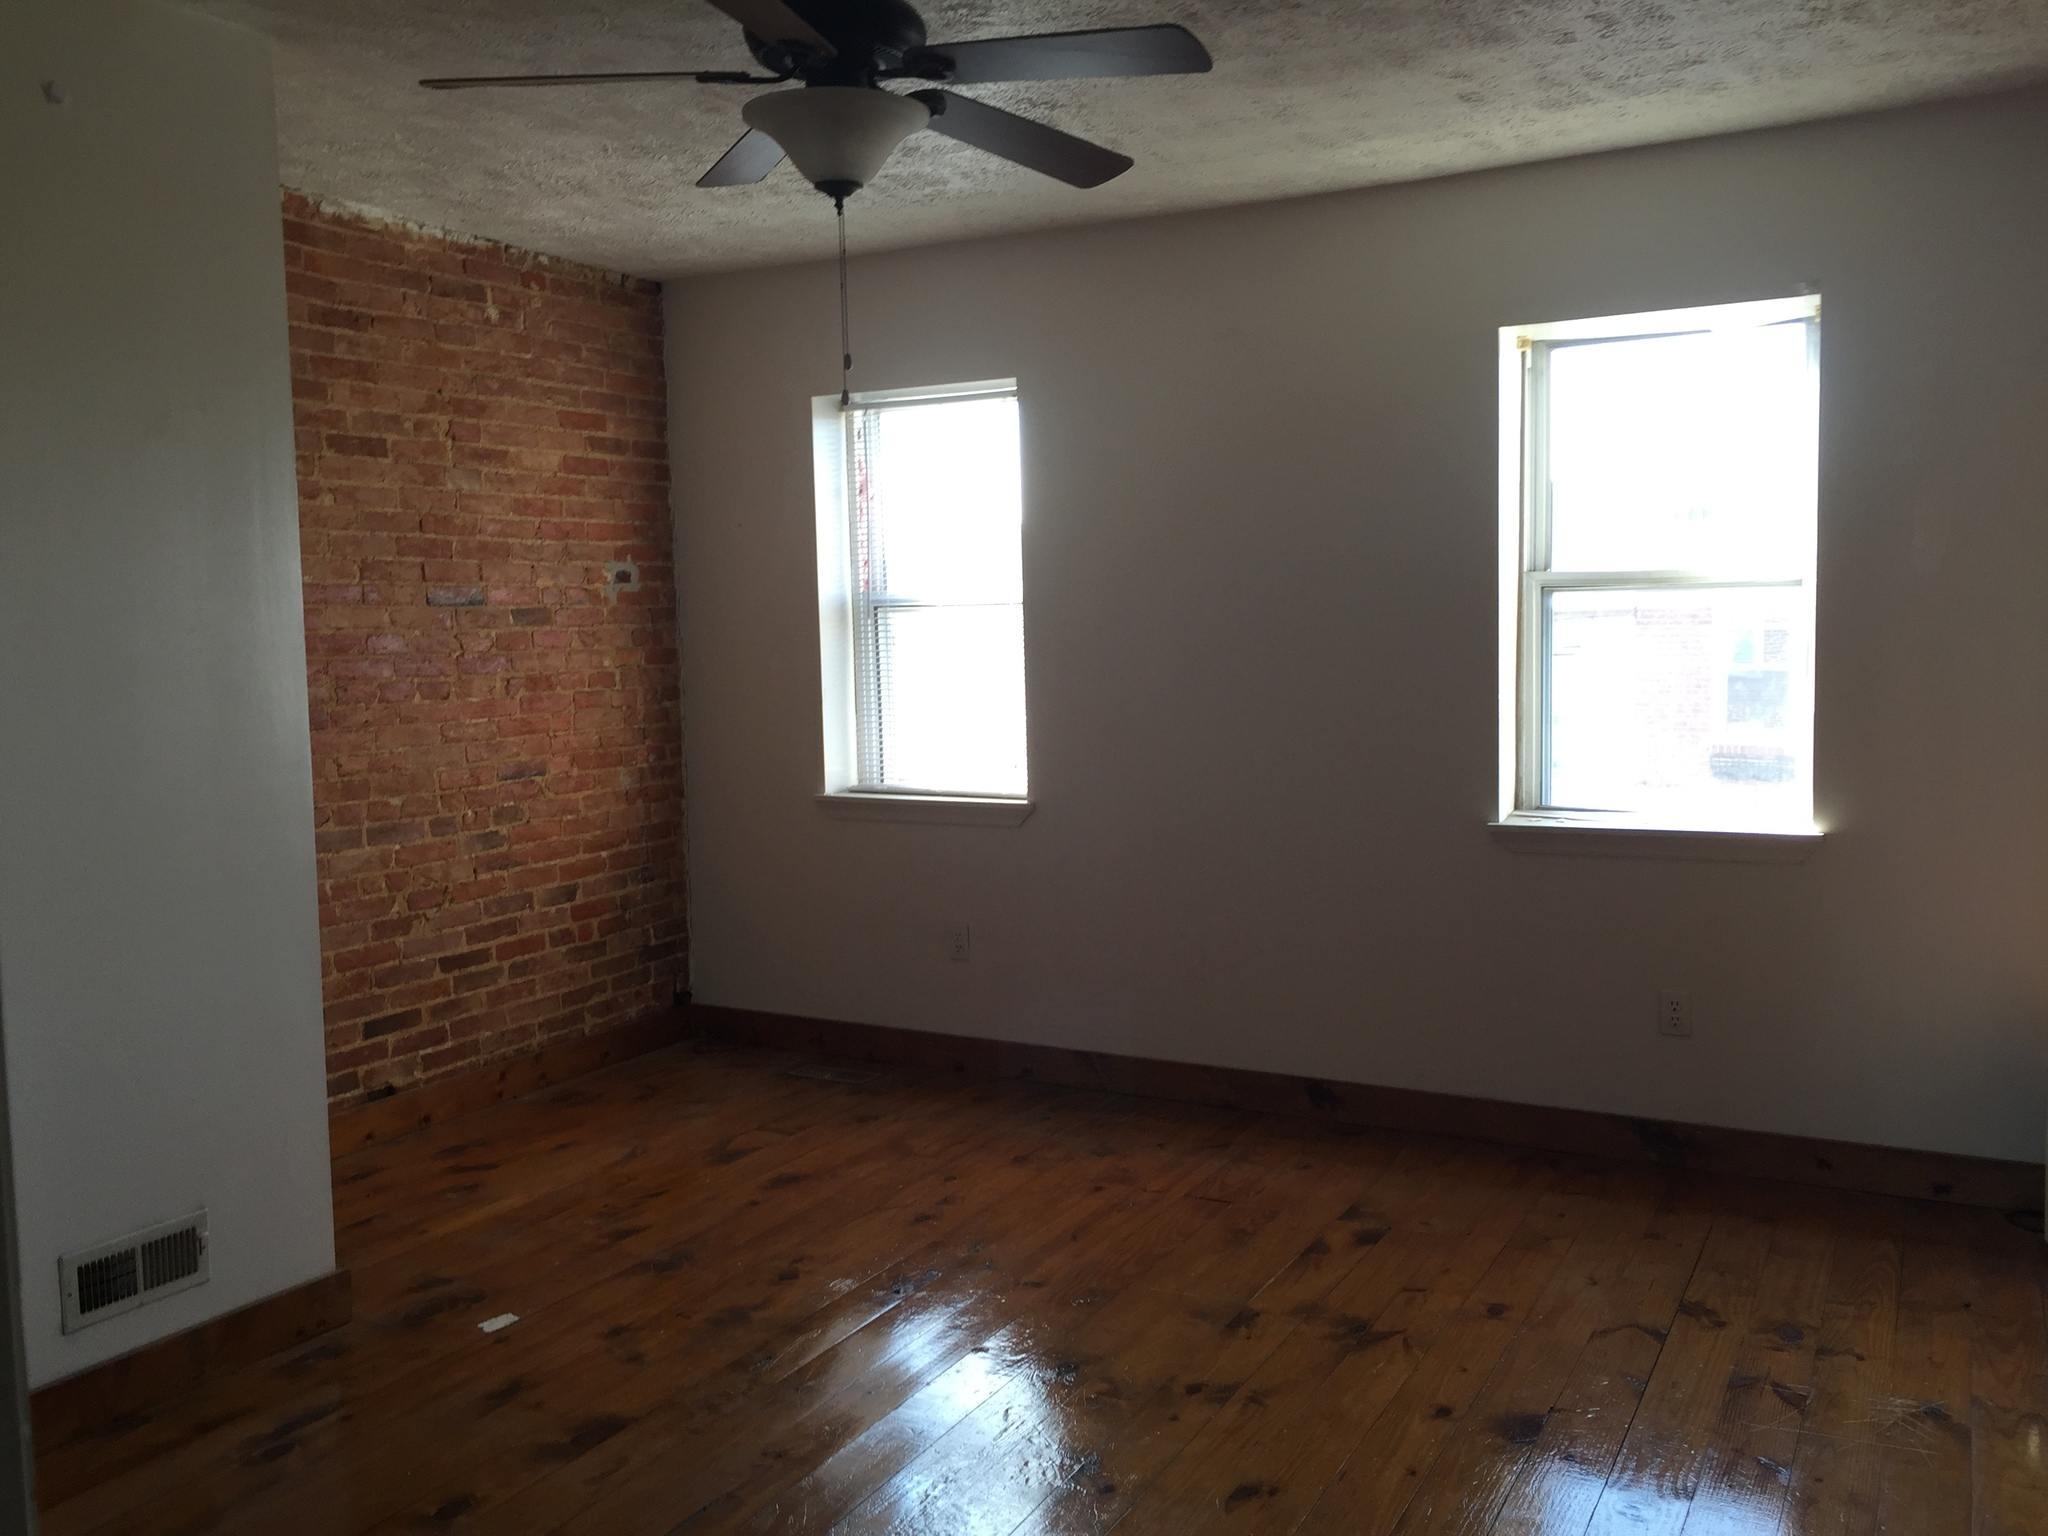 1449 Light Street #2 Baltimore, MD 21230